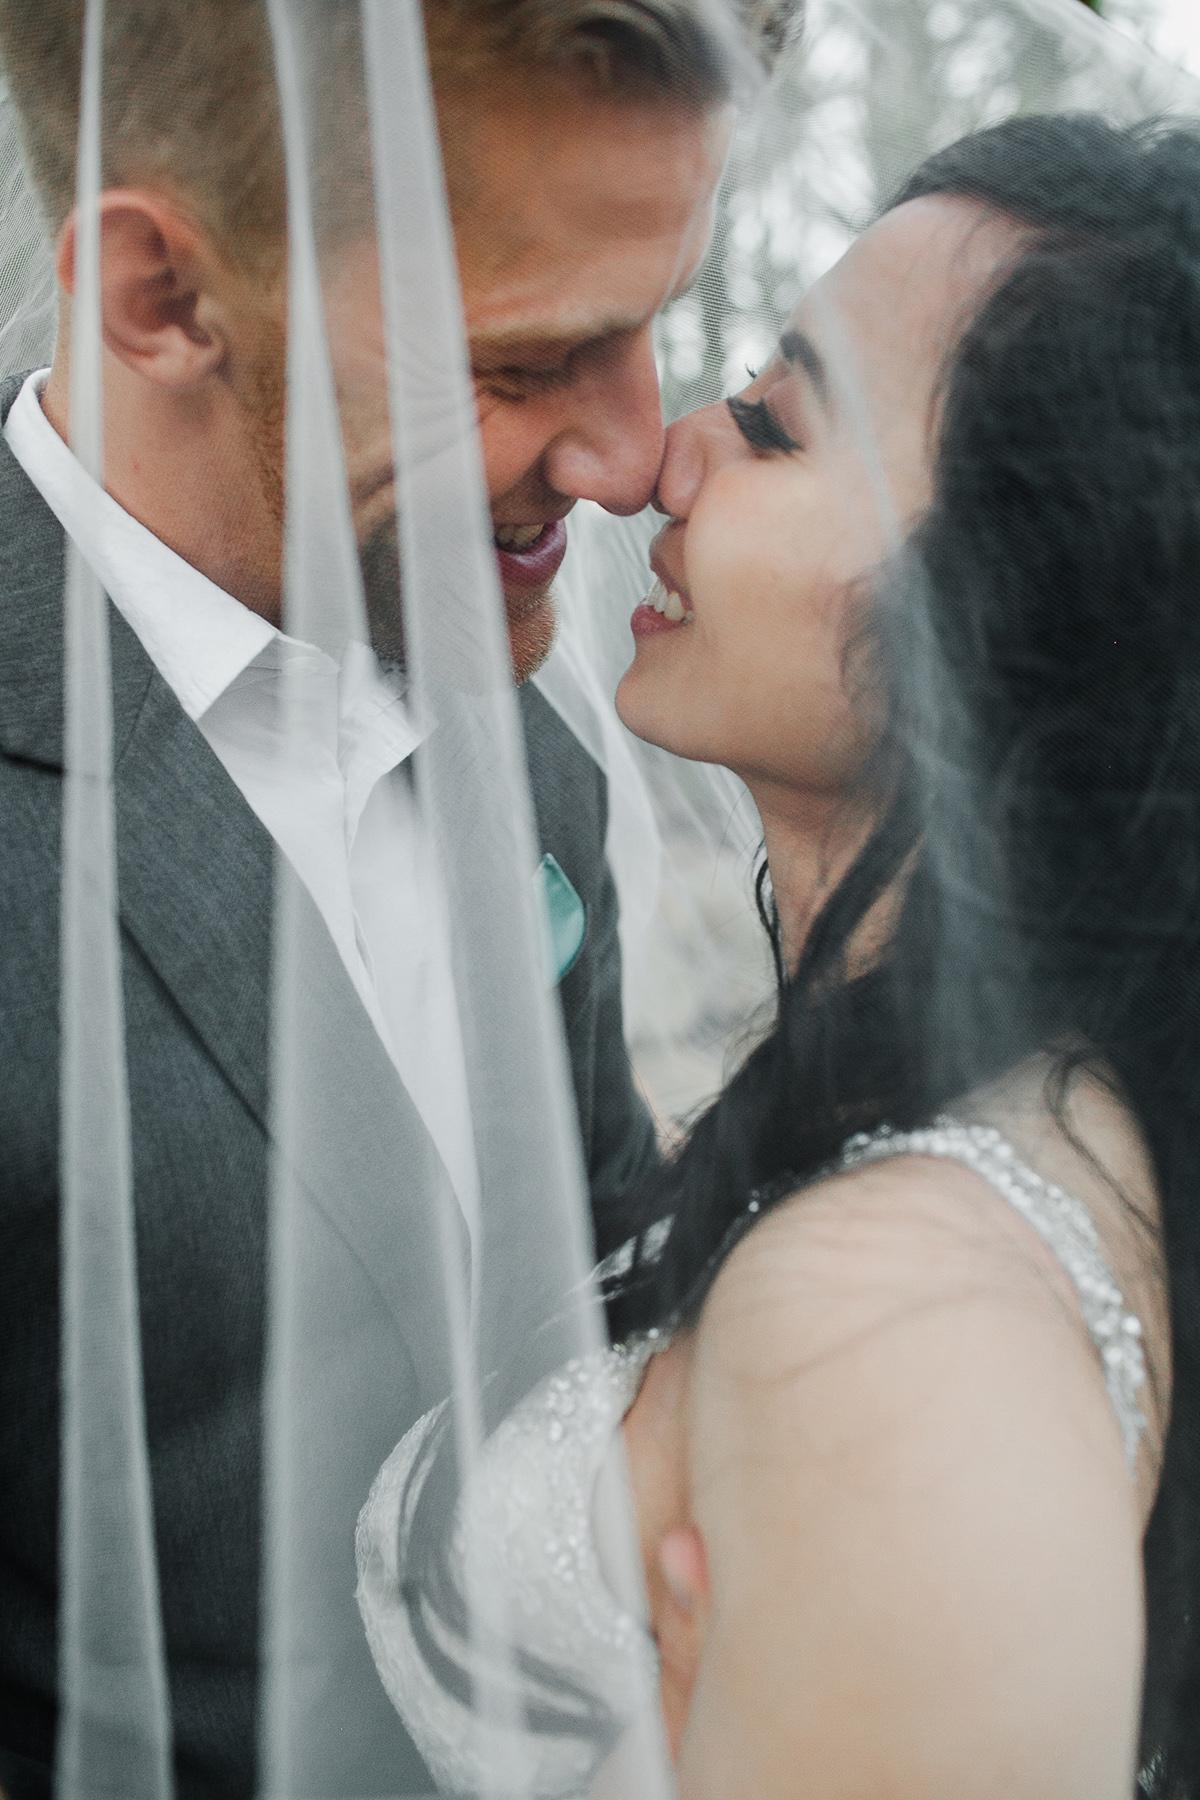 kristine_robert_wedding103.jpg